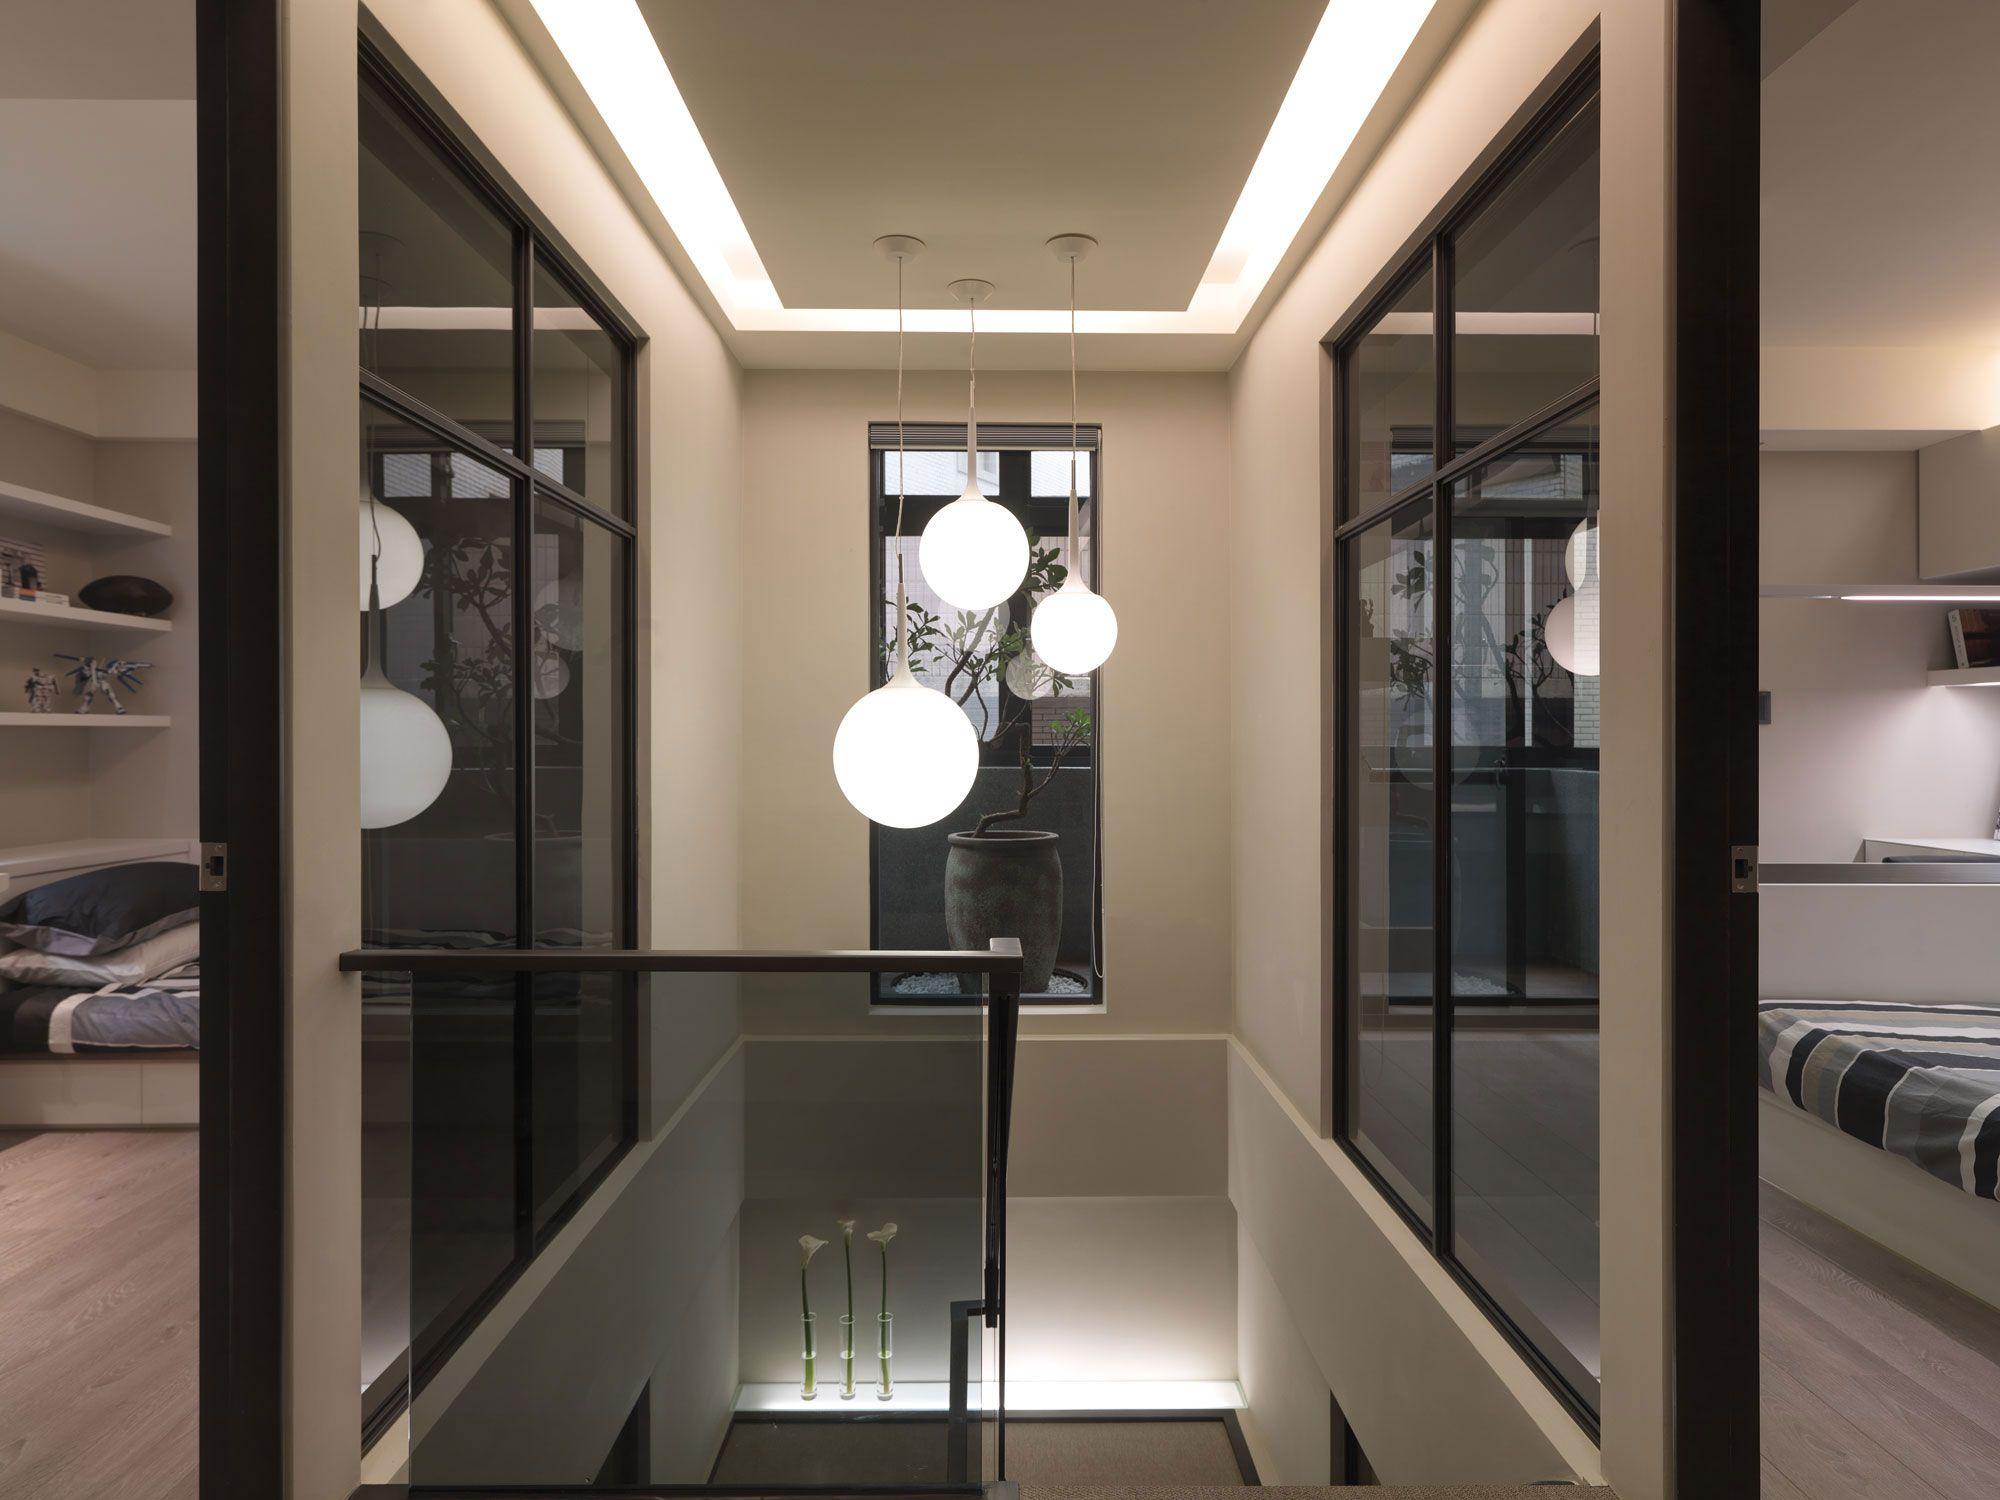 A-Multilevel-Contemporary-Apartment-16